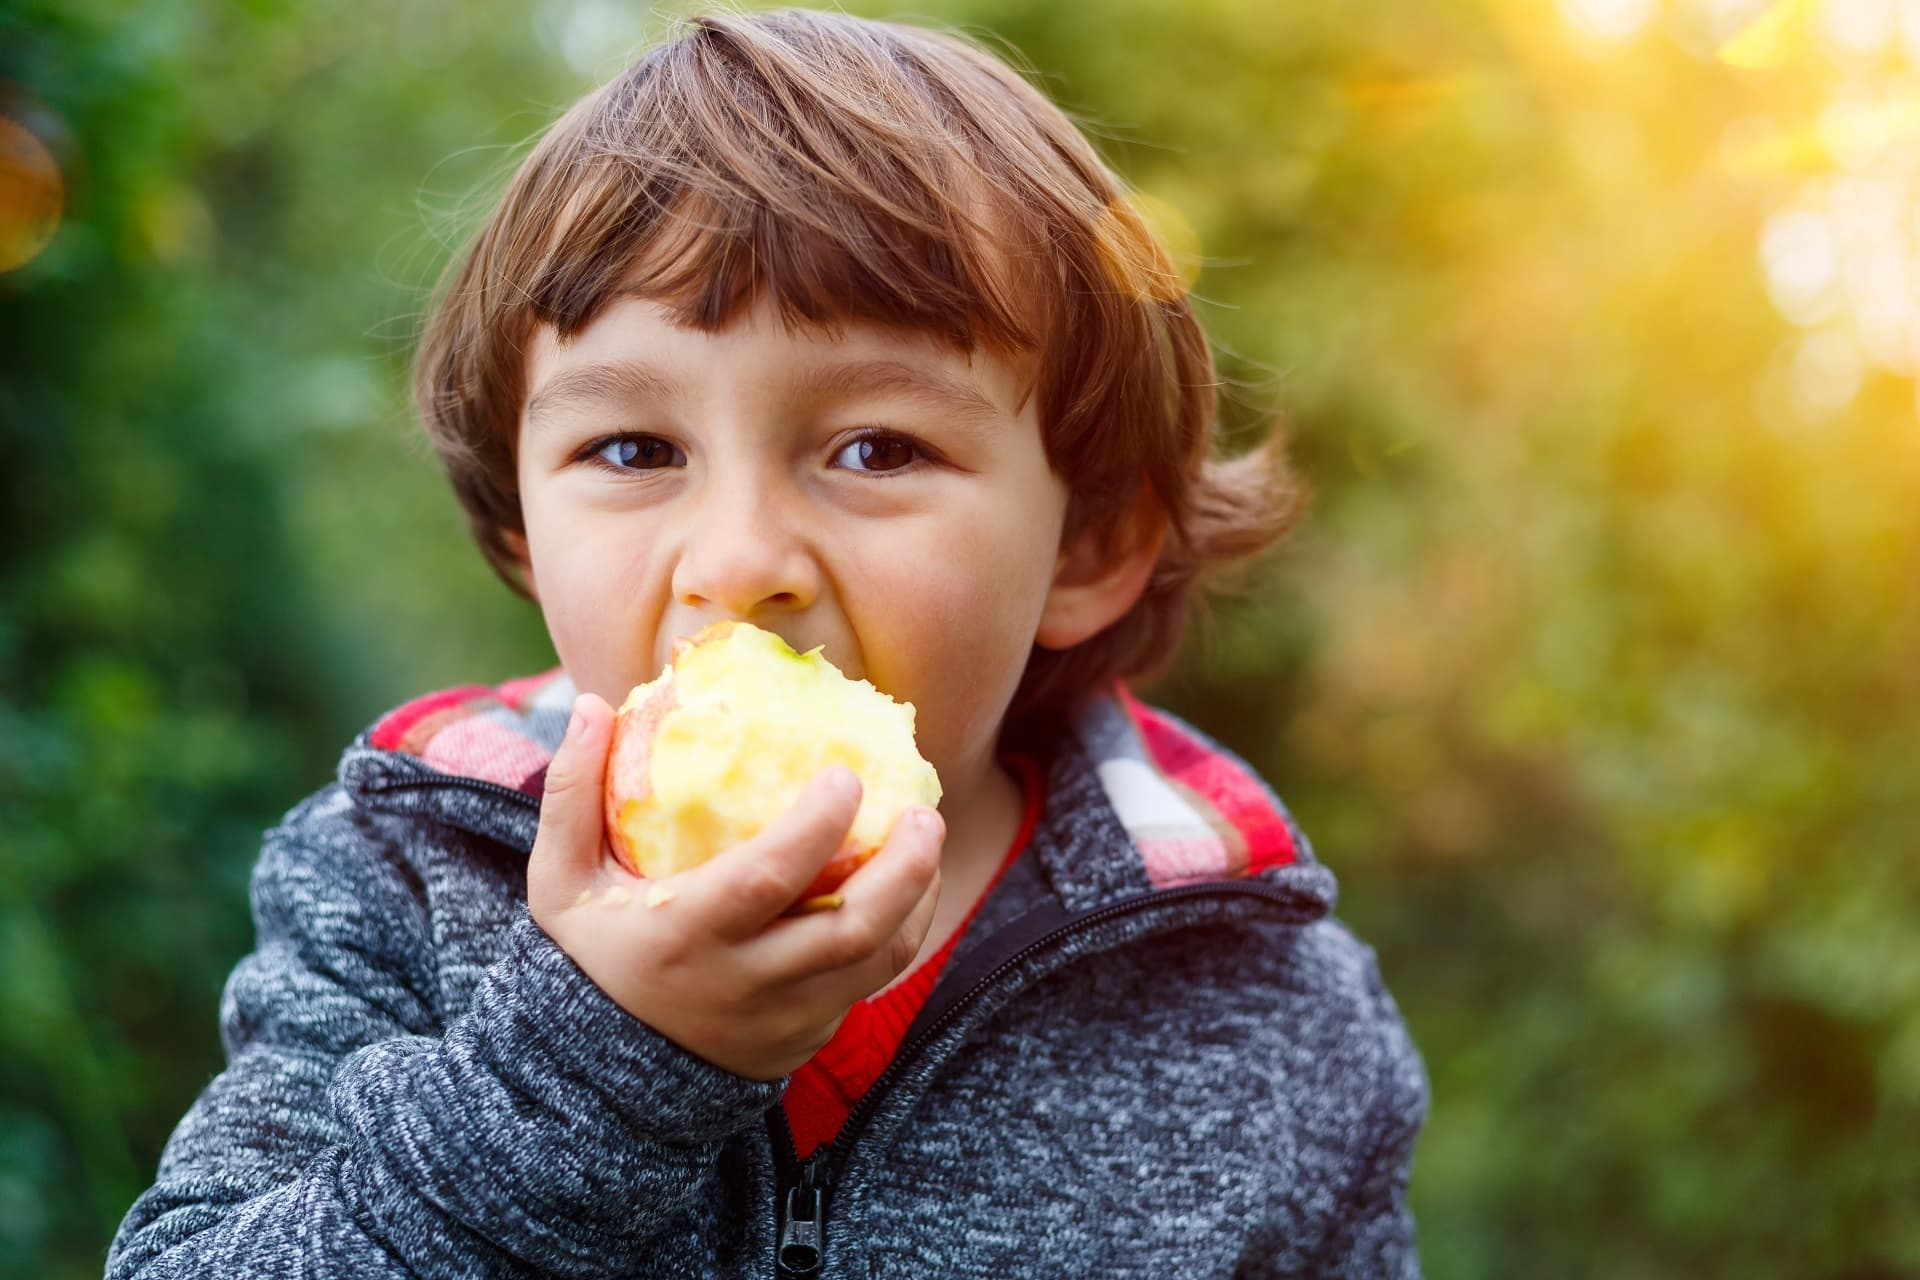 Junge isst Apfel